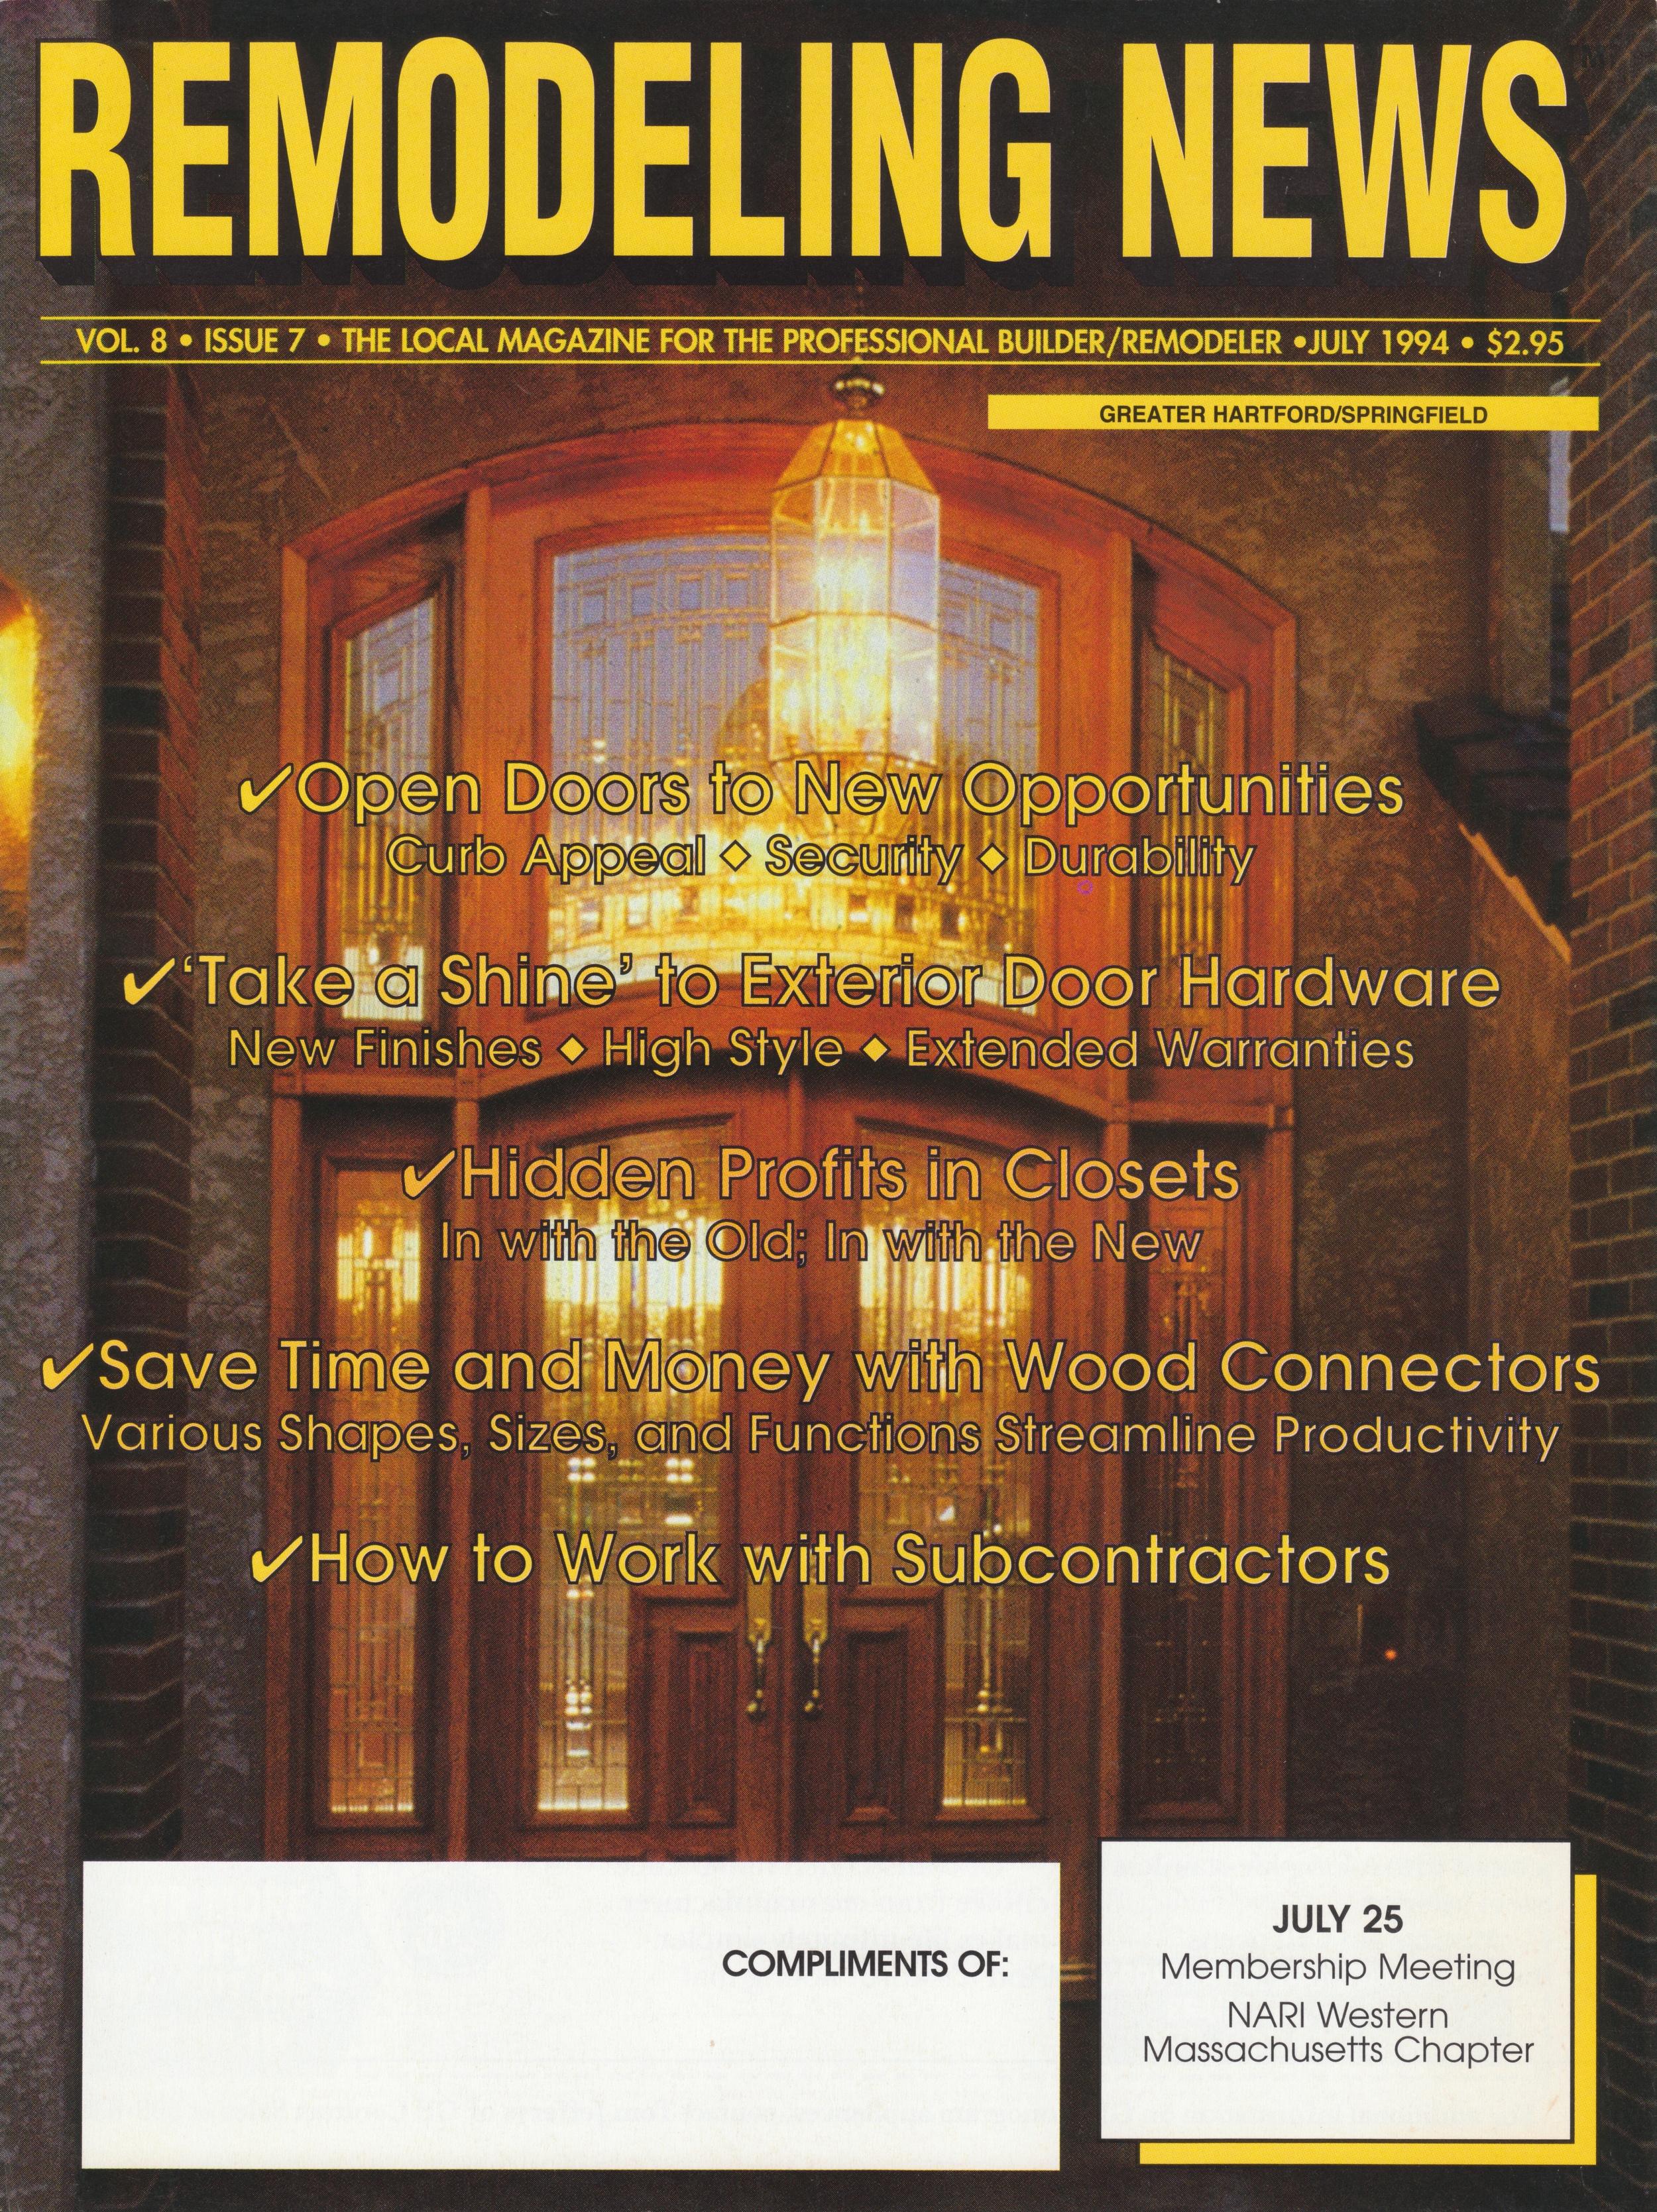 Remodeling_News1994a.jpg